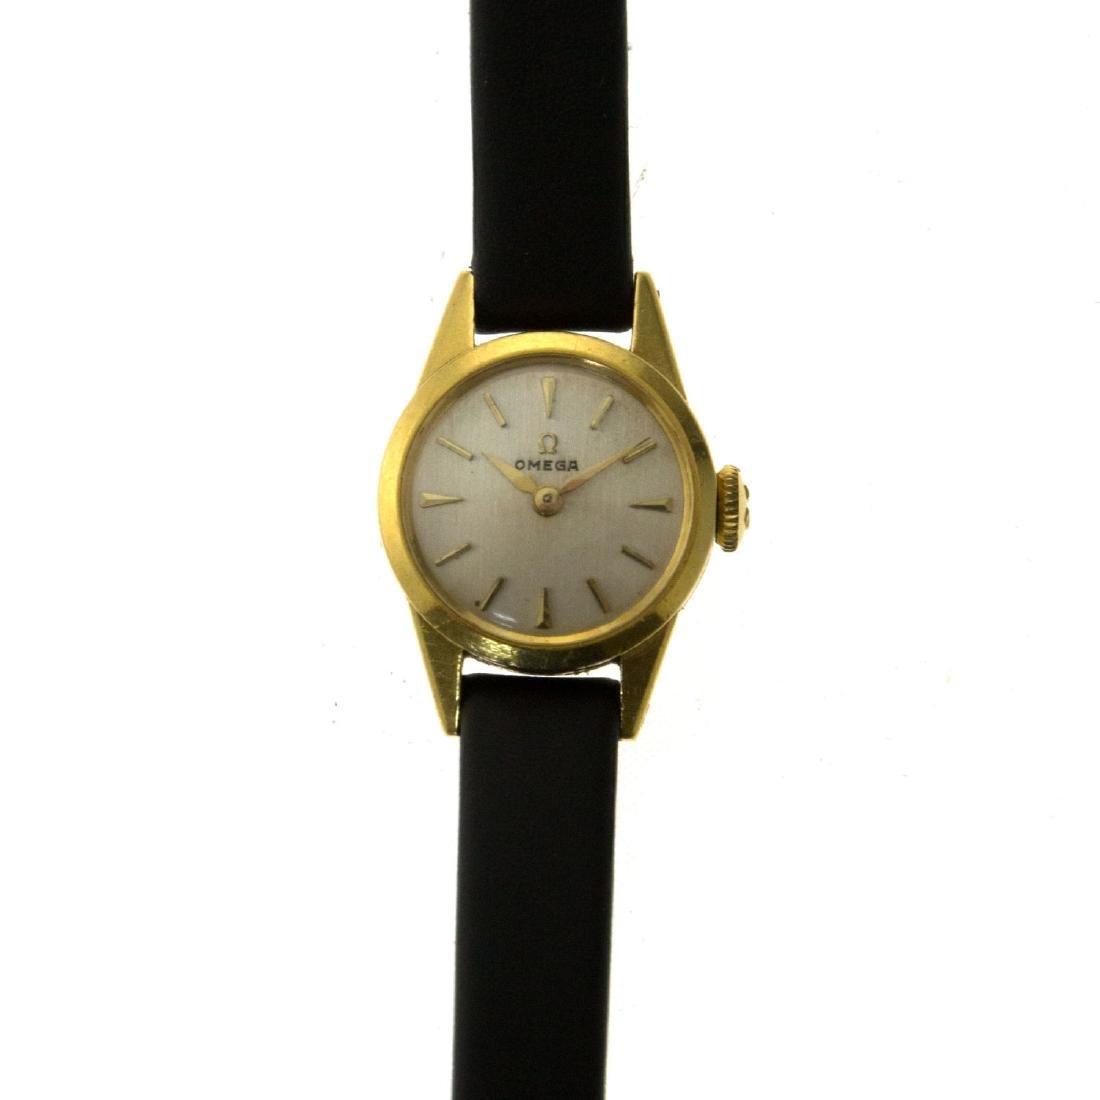 Omega 18k Yellow Gold Ladies Wrist Watch.